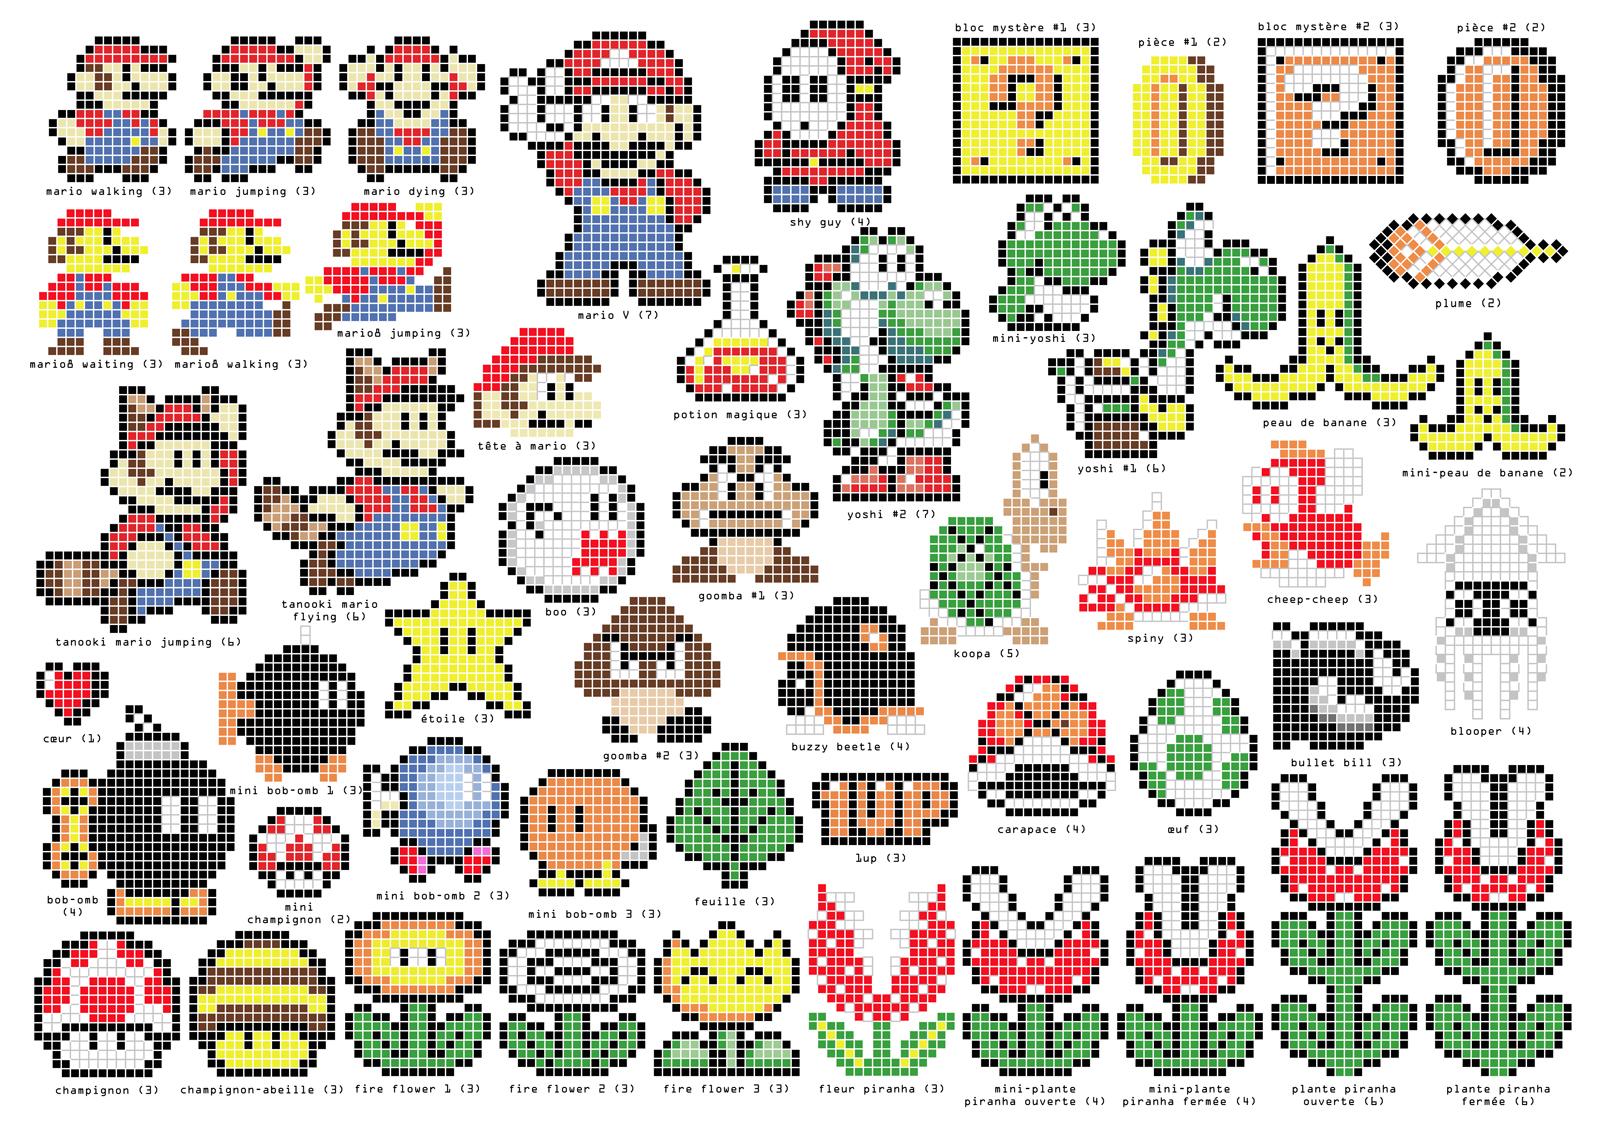 Handmade Pixel Art How To Draw Cute Graffiti Pixelart Game Pixel Art